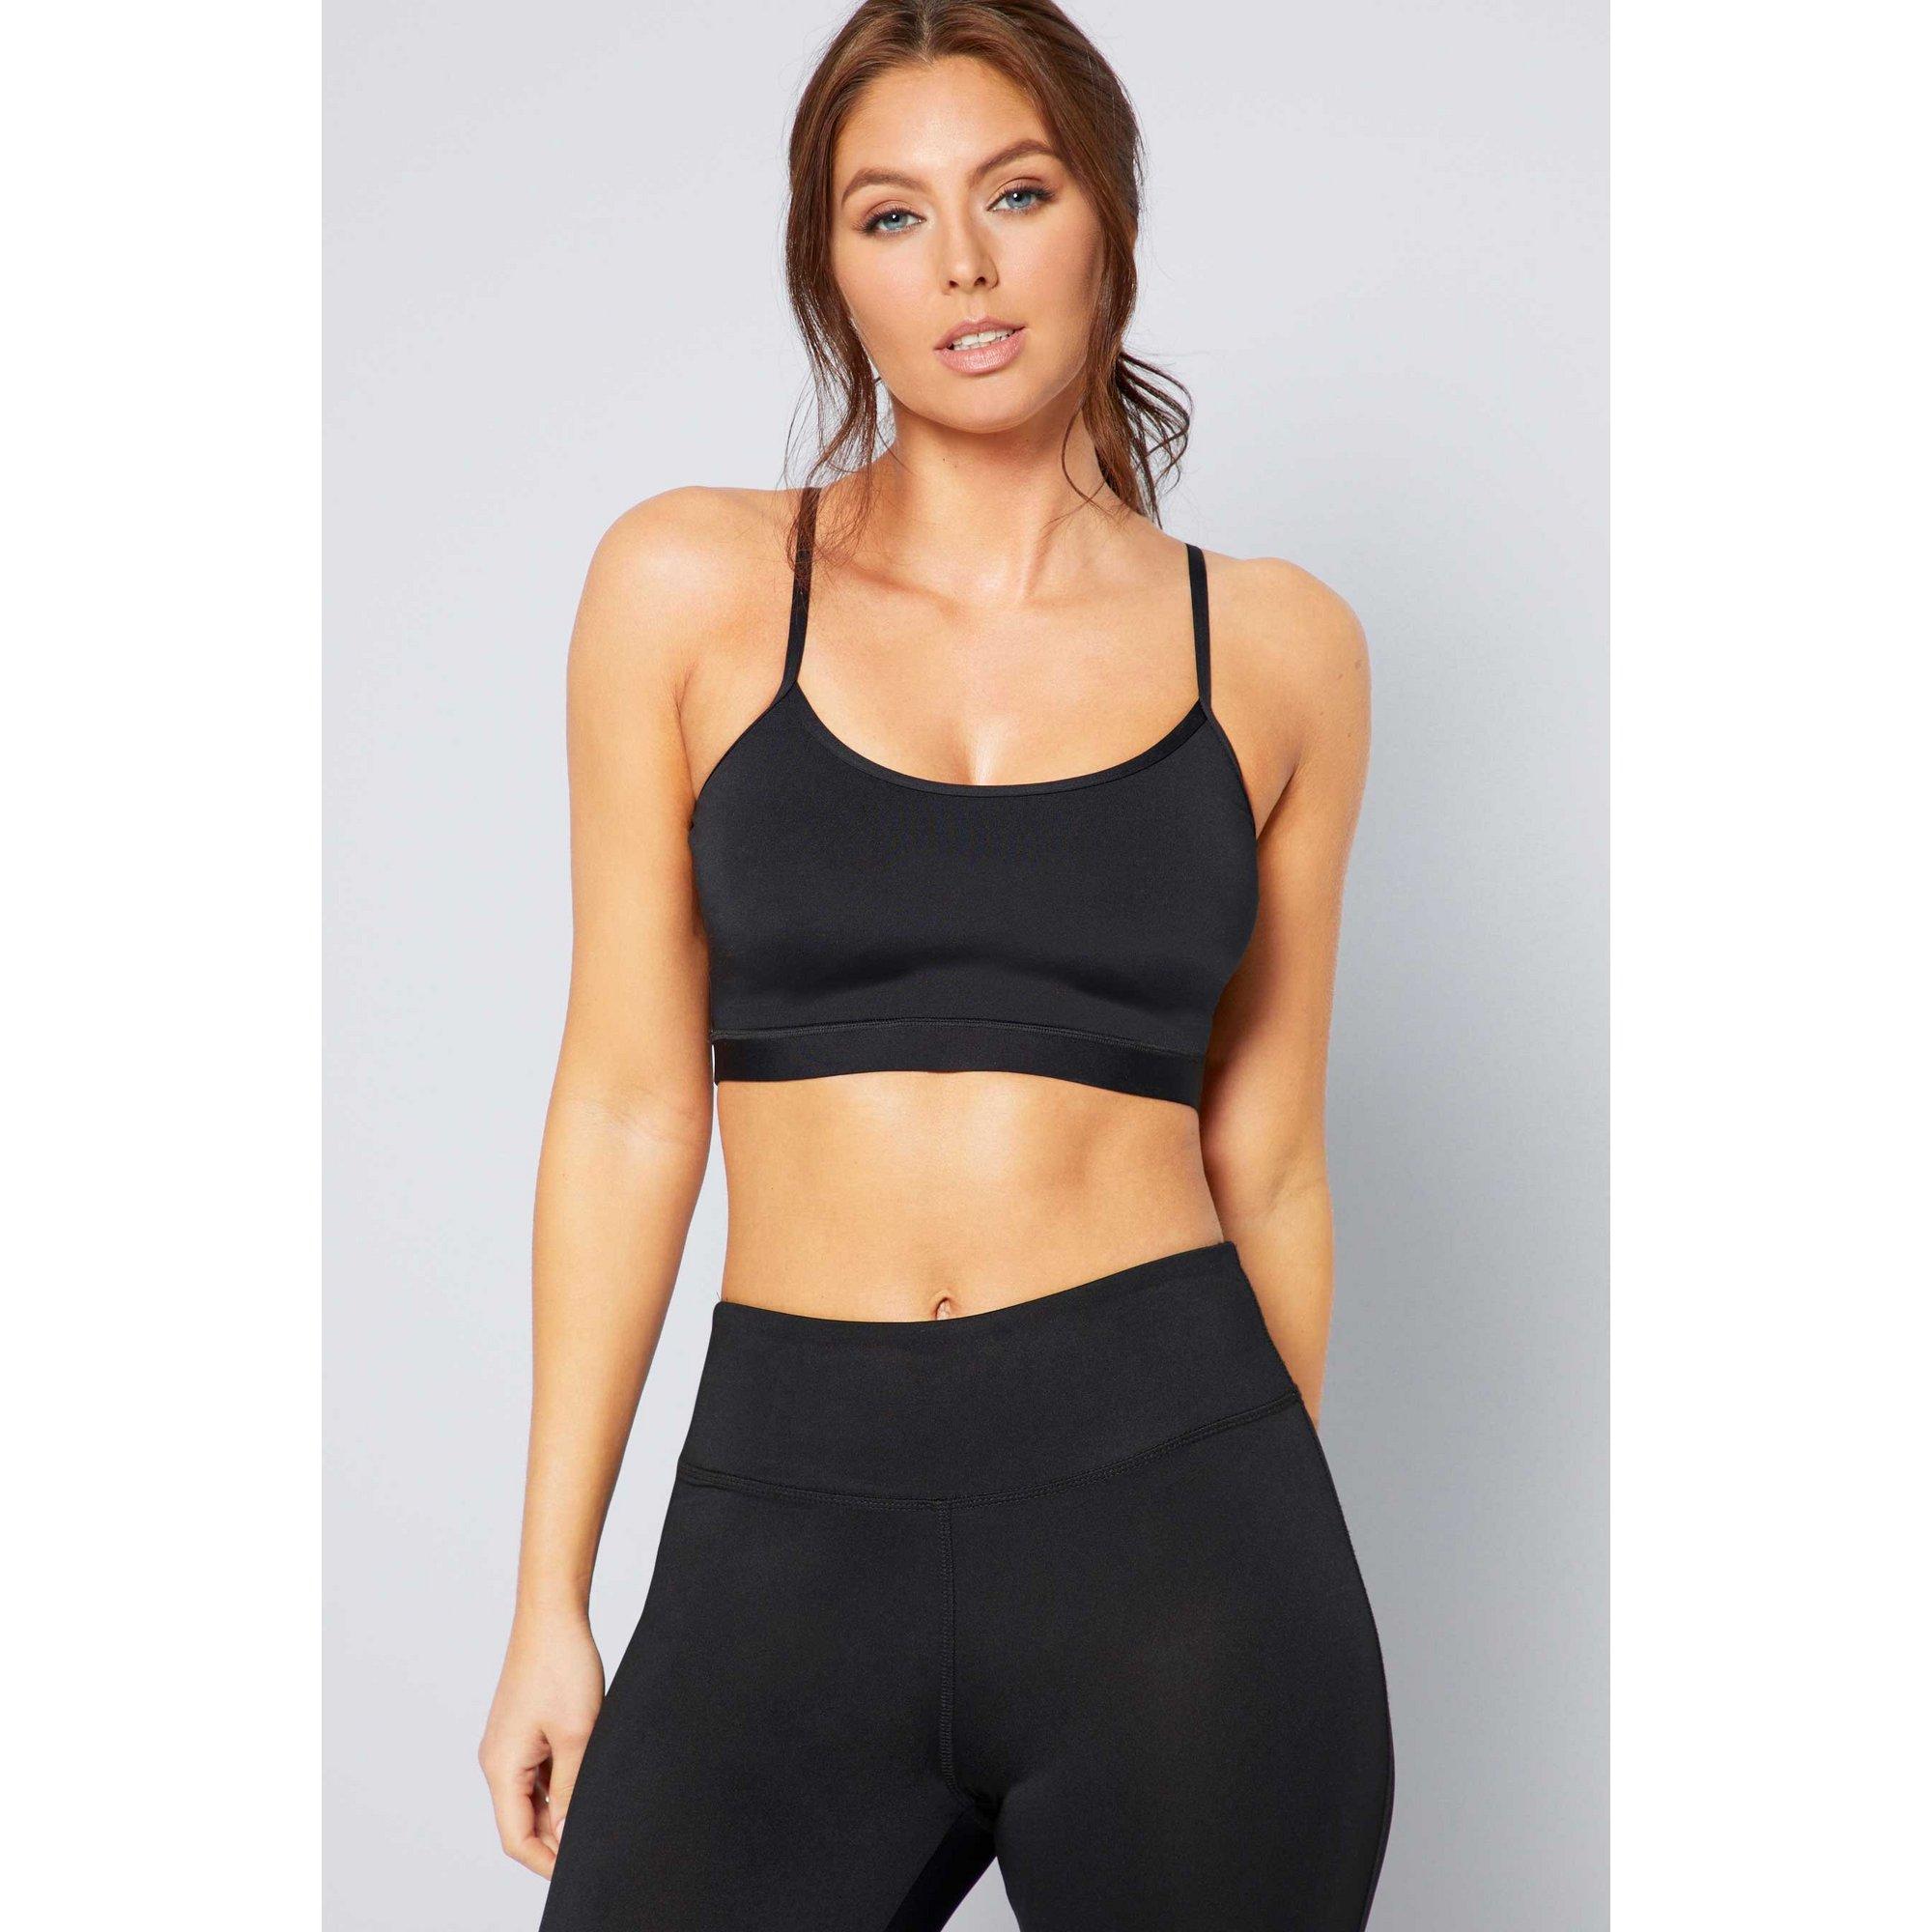 Image of Activewear Black Crop Top